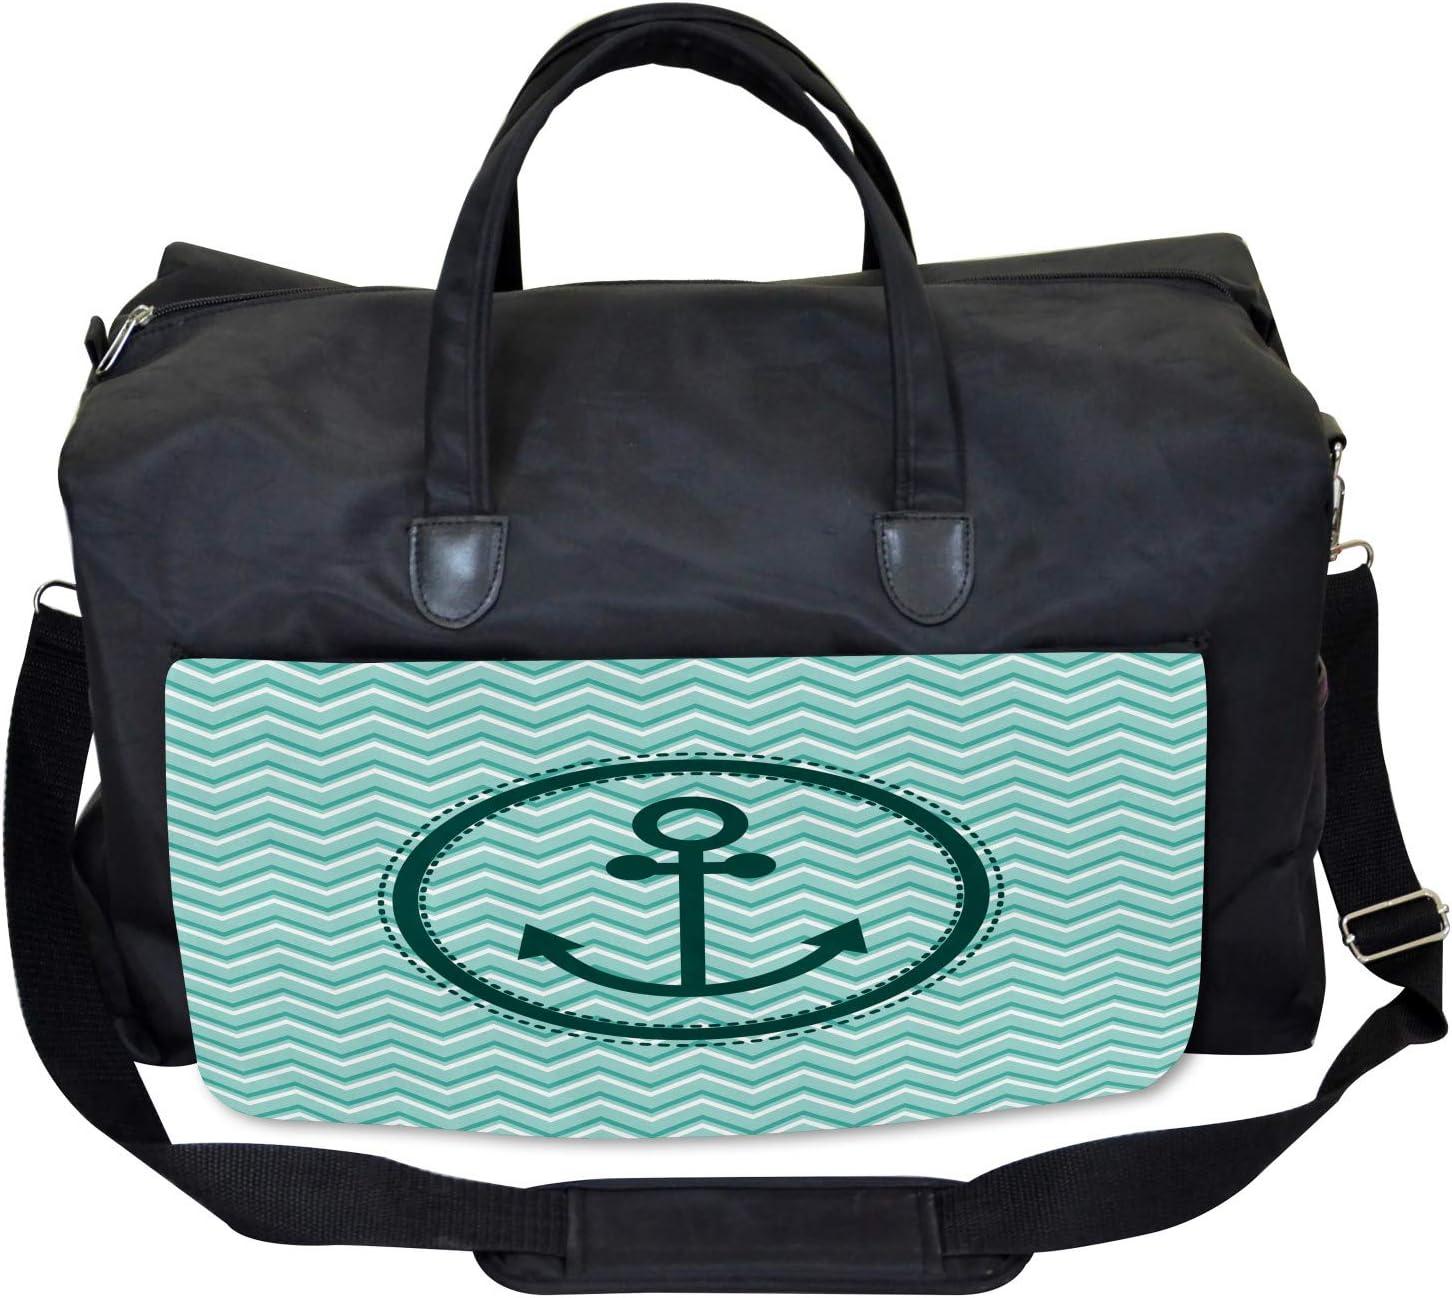 Large Weekender Carry-on Zig Zag Pattern Ambesonne Black White Gym Bag